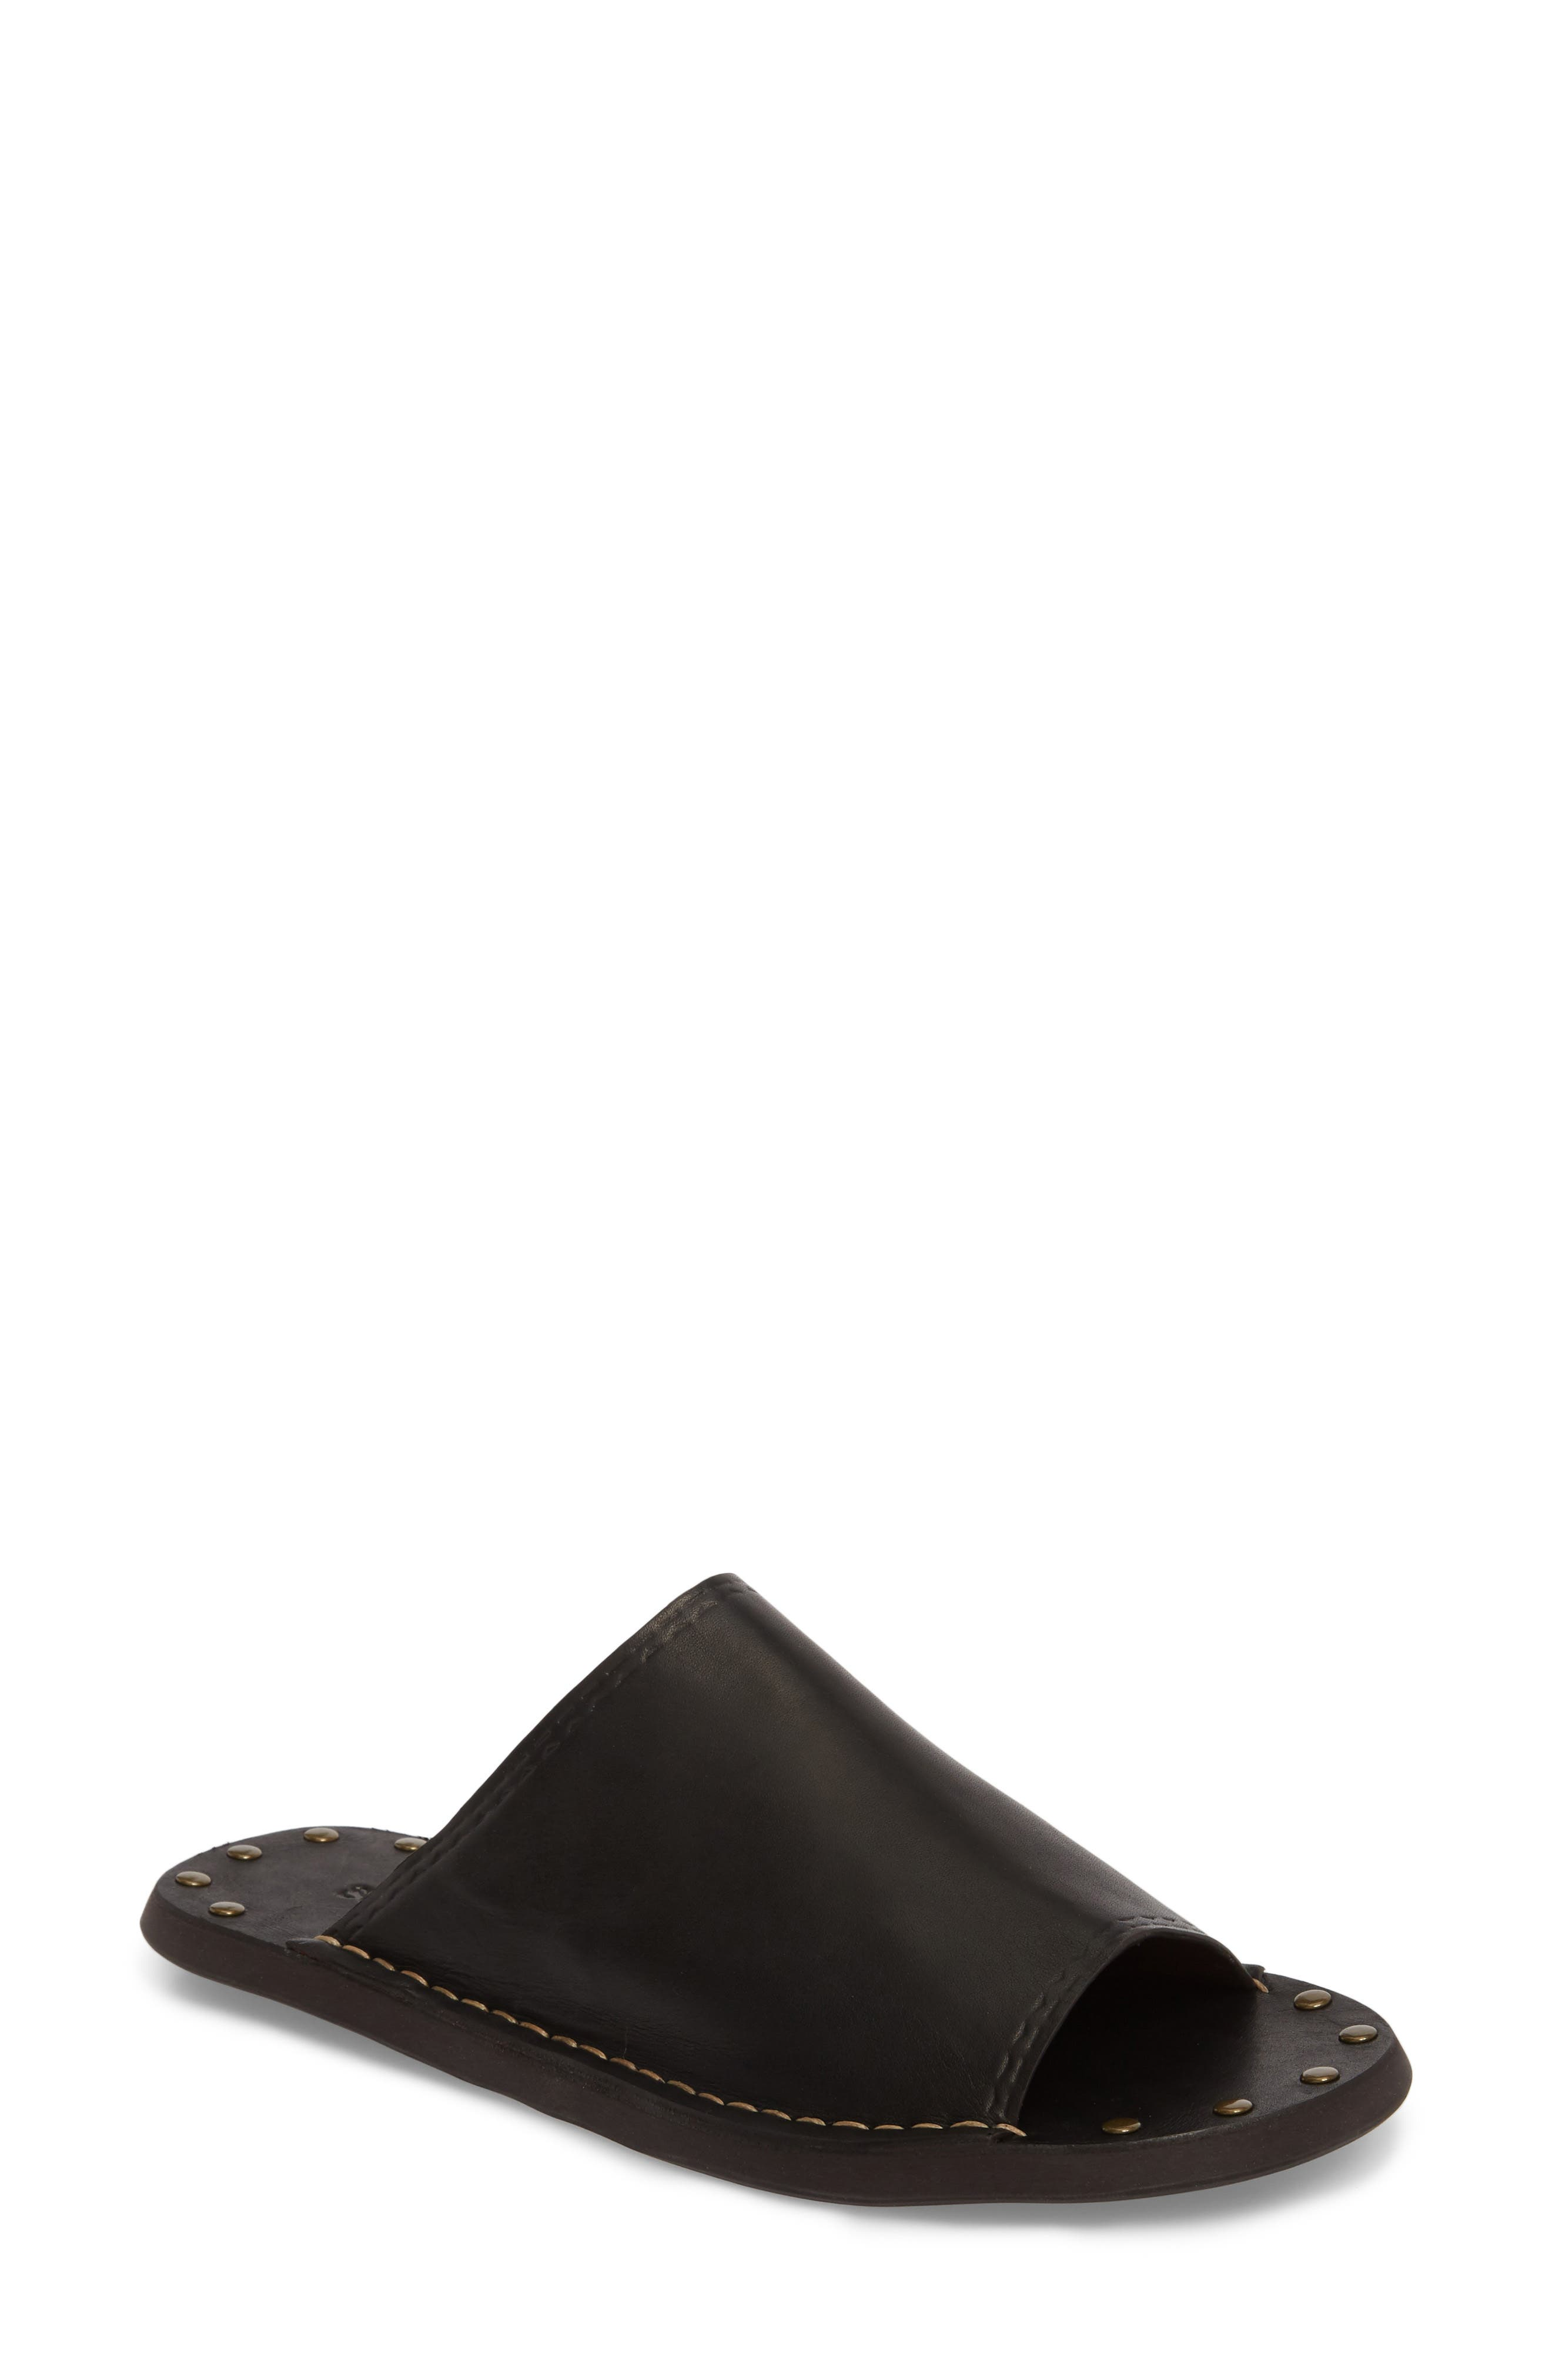 Leila Slide Sandal,                         Main,                         color, Black